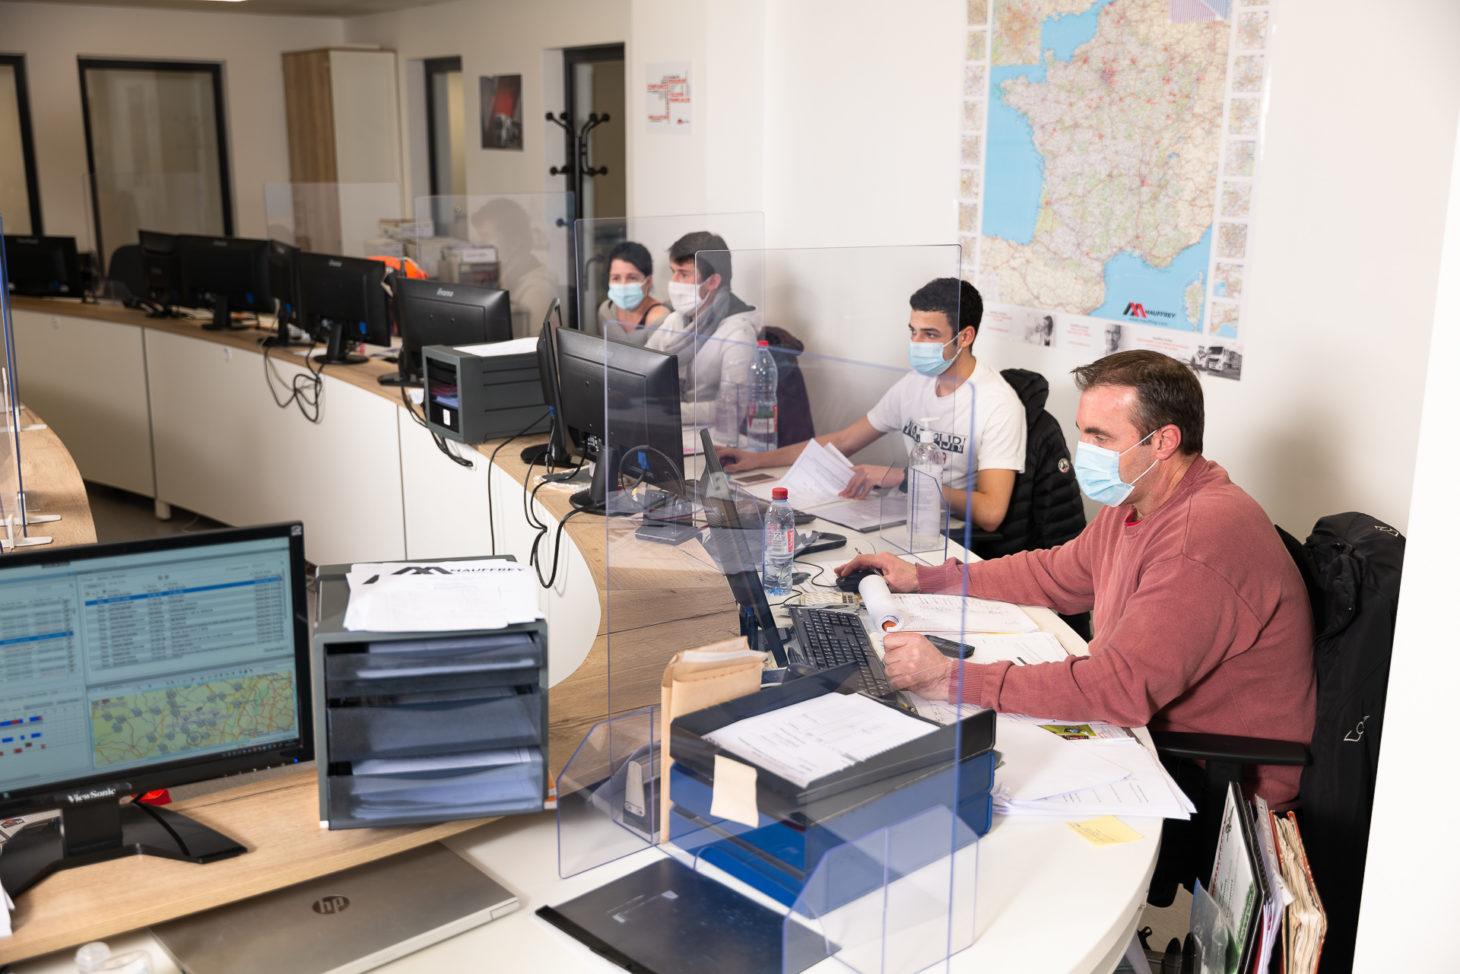 Métier Mauffrey Sas Bureau En Situation Fév 2021